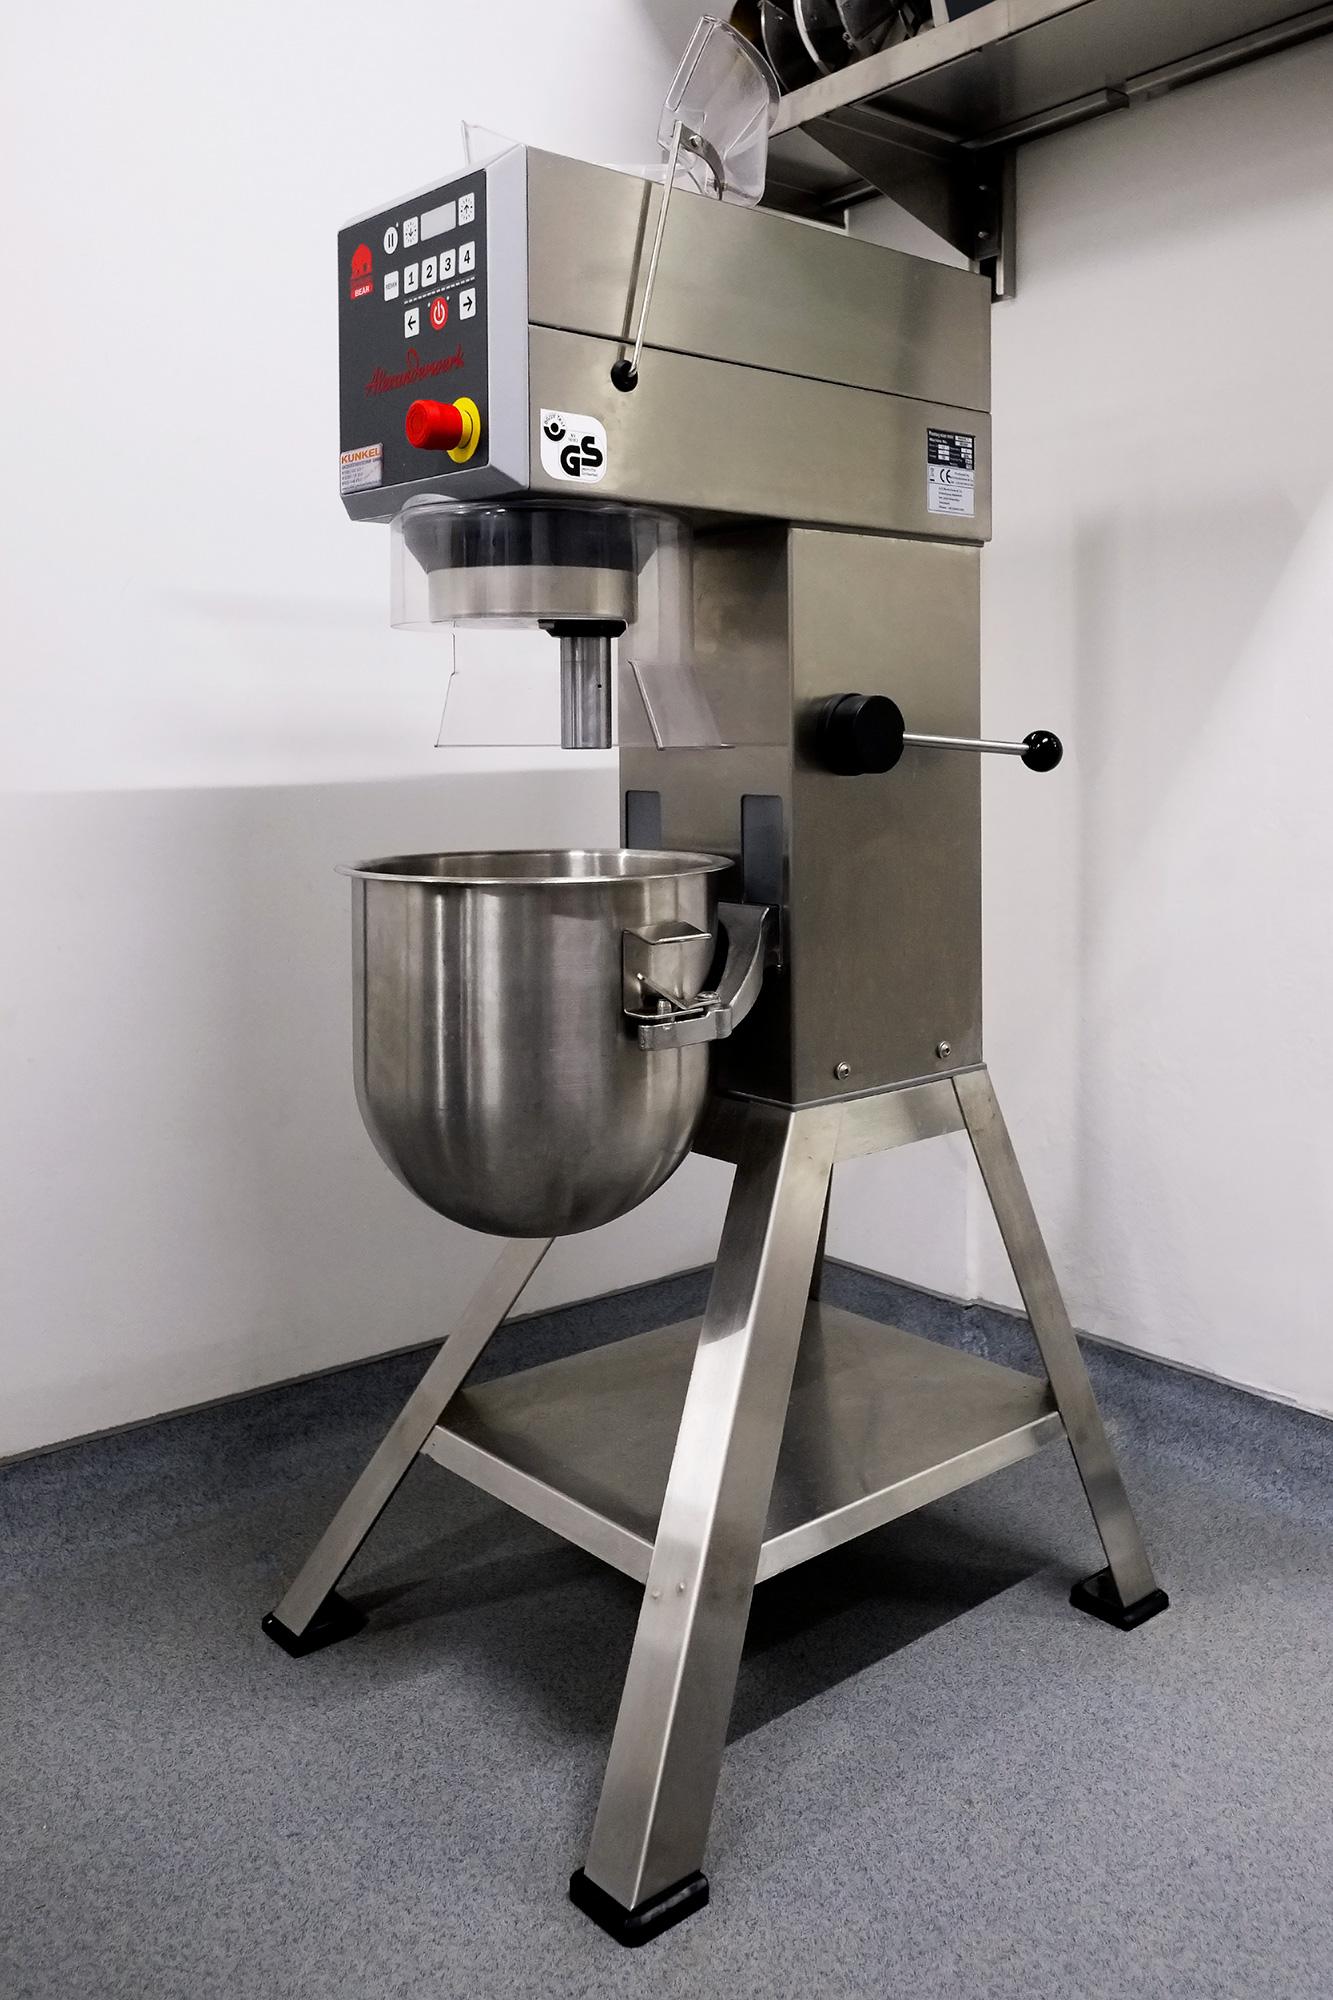 Butterstulle Catering Berlin Mischmaschine